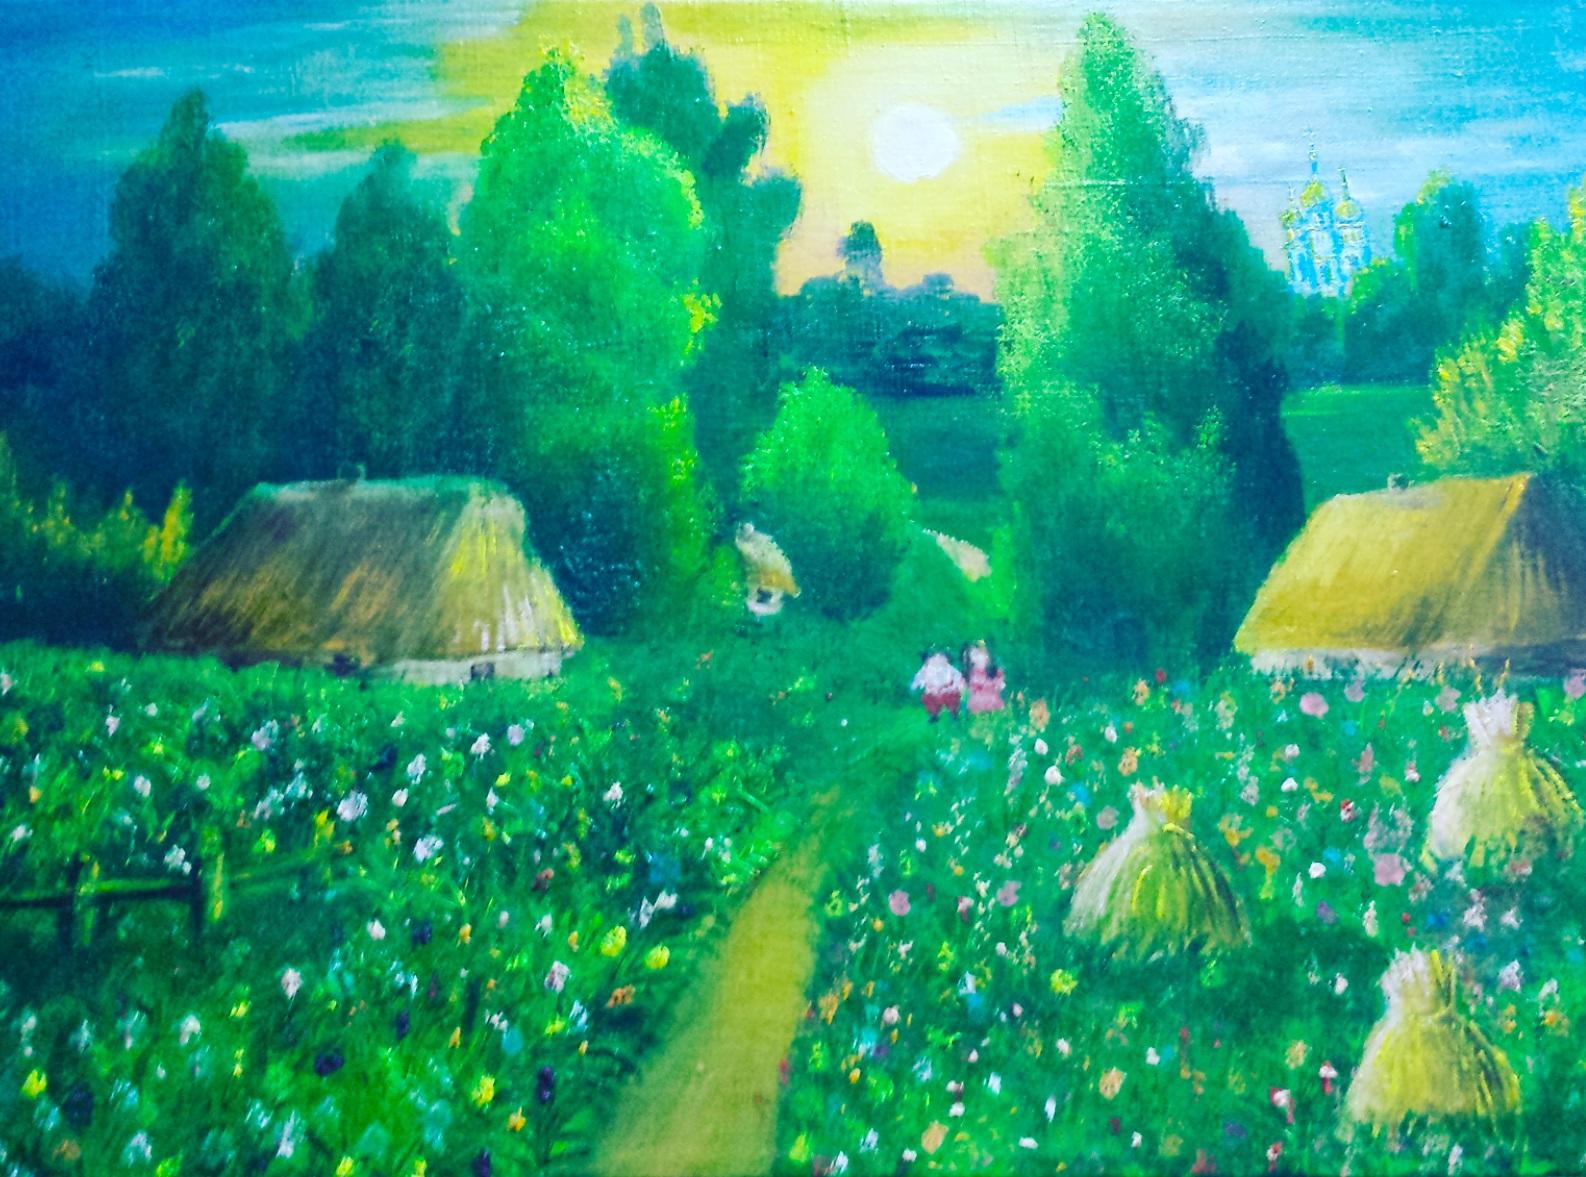 «Деревенский пейзаж», Александра Дубинина, холст, масло, 40х60 см, 2017 г.